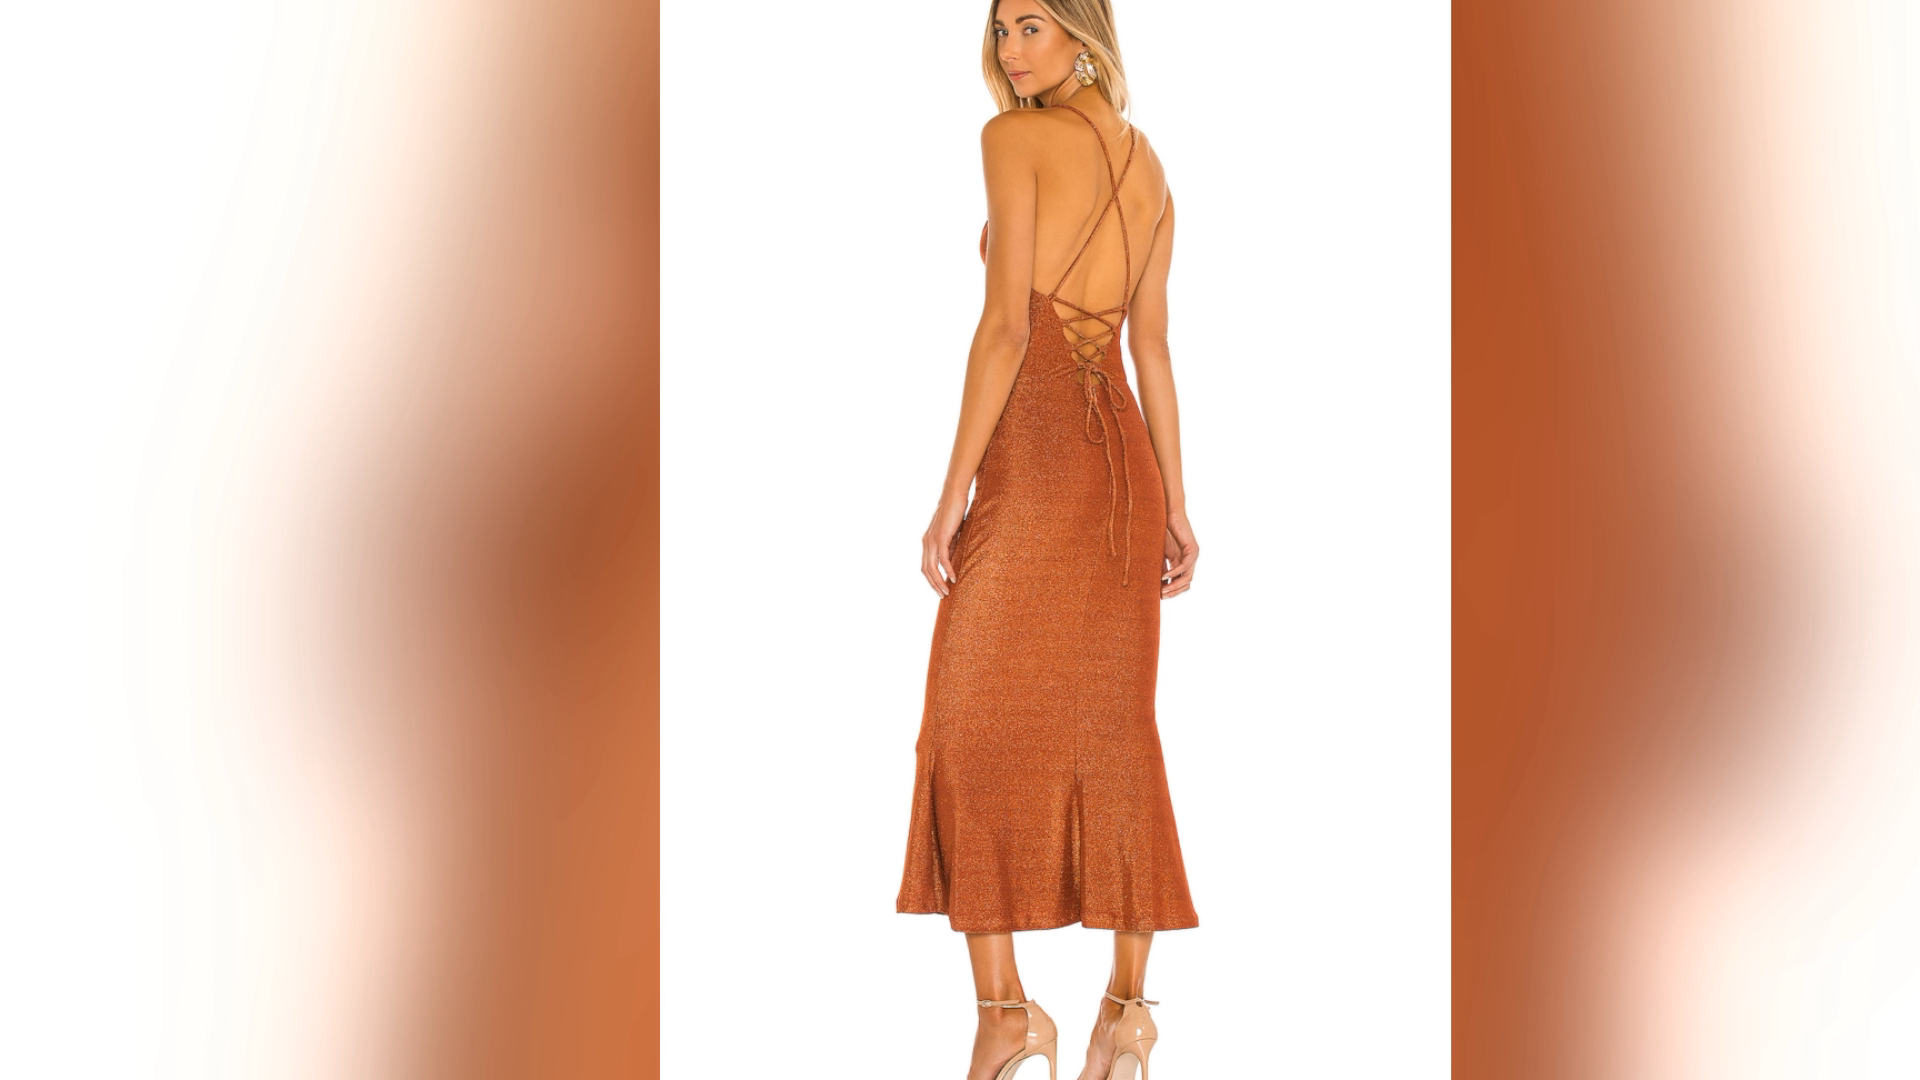 2021 OEM summer custom casual clothes Halterneck backless ruffles boho sun beach midi dress for women